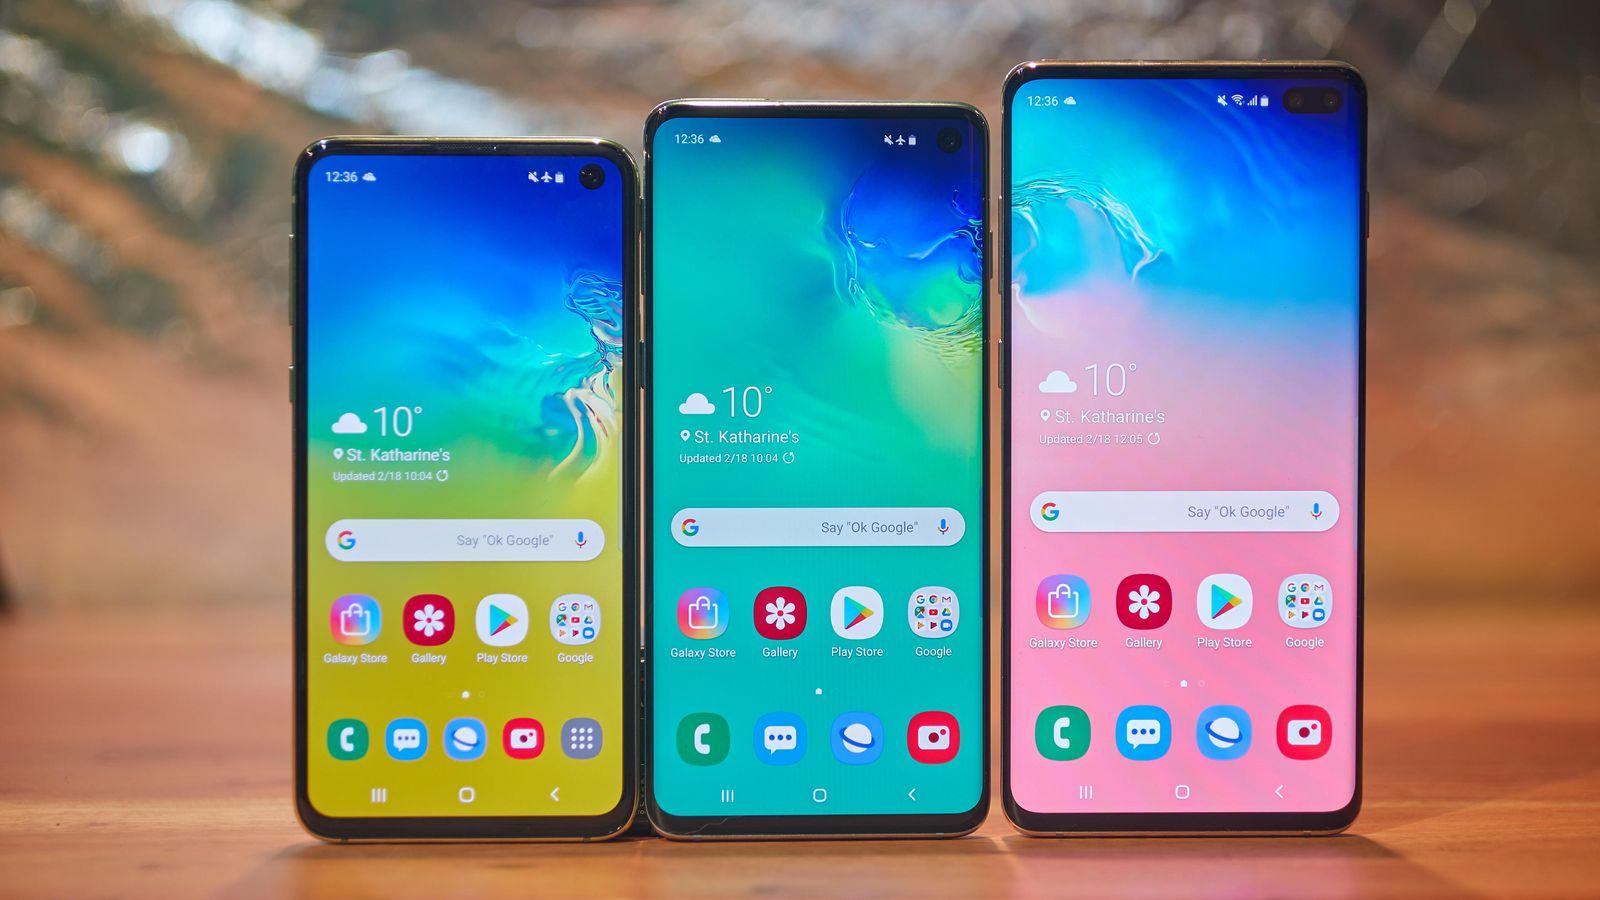 Samsung Galaxy S10 Tldが優れた壁紙をリスト モバイルニュース